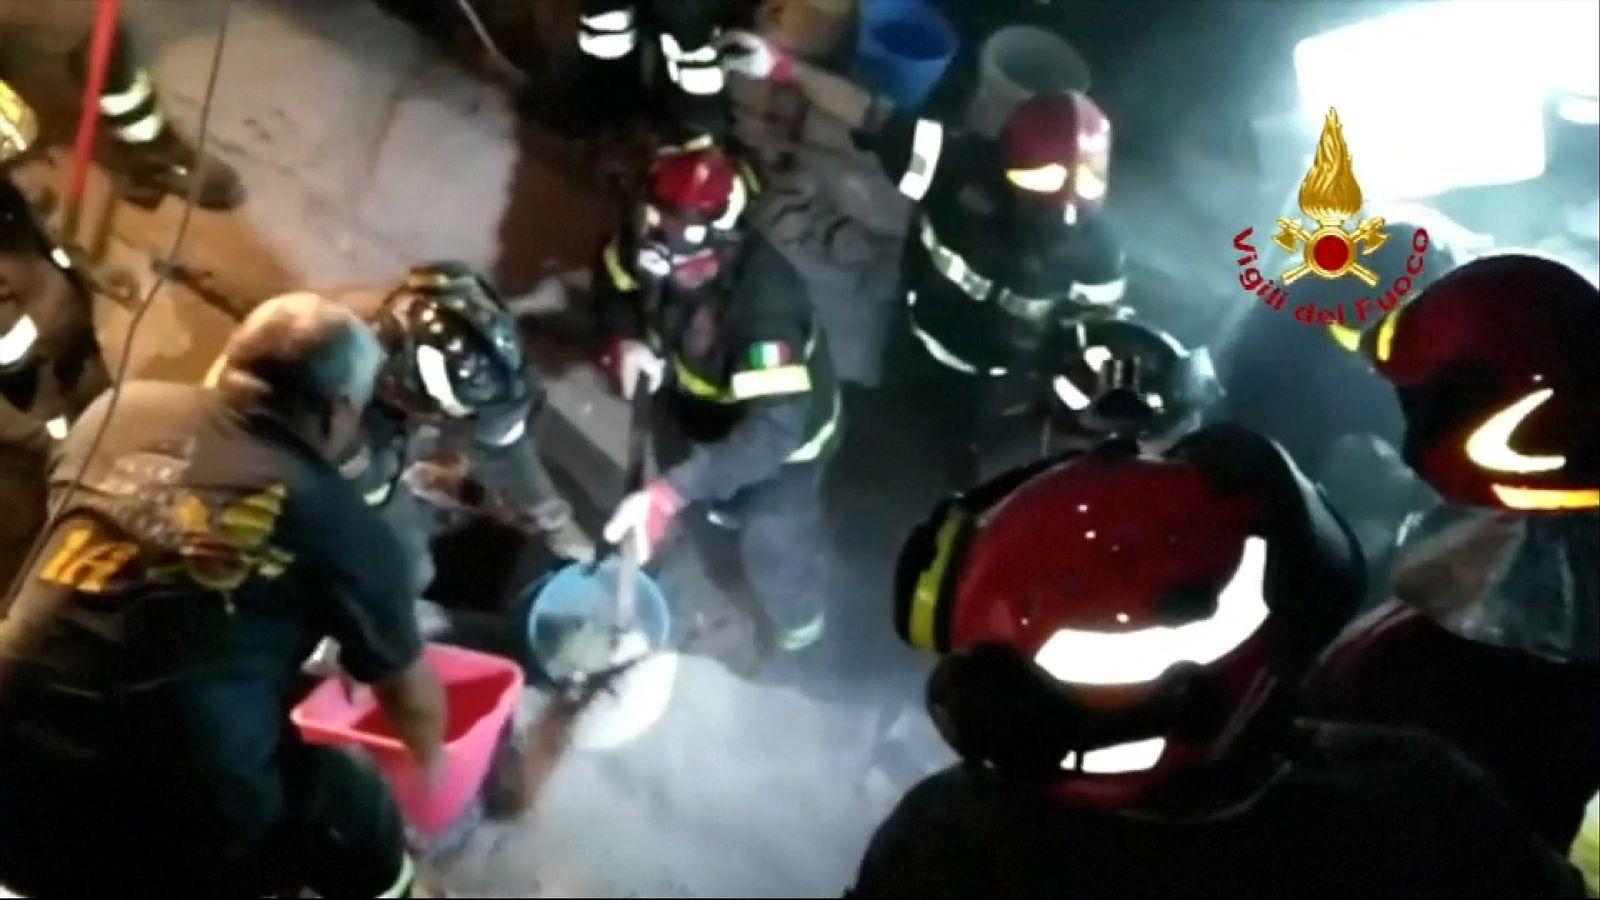 Quake hits Italian island, buildings collapse